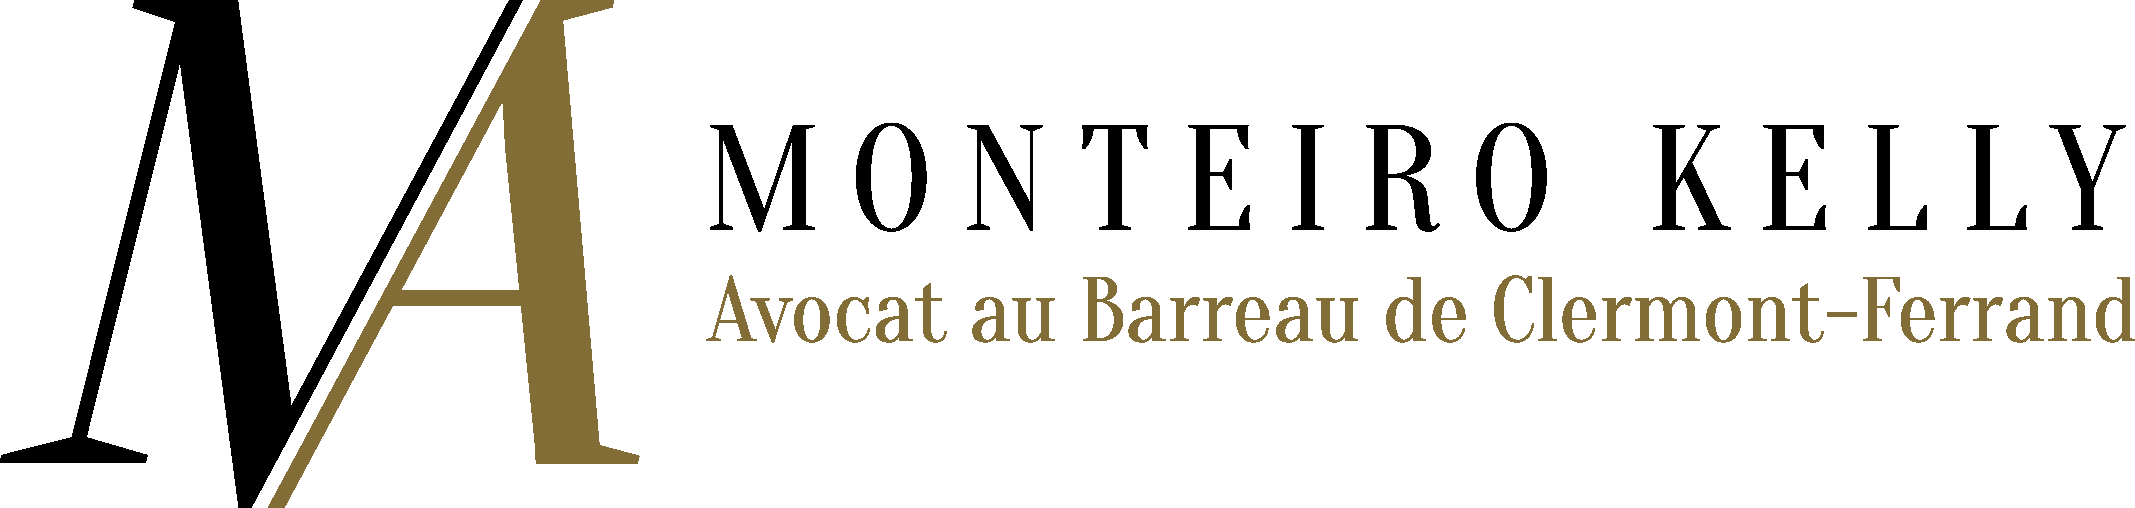 Avocat au Barreau de Vienne